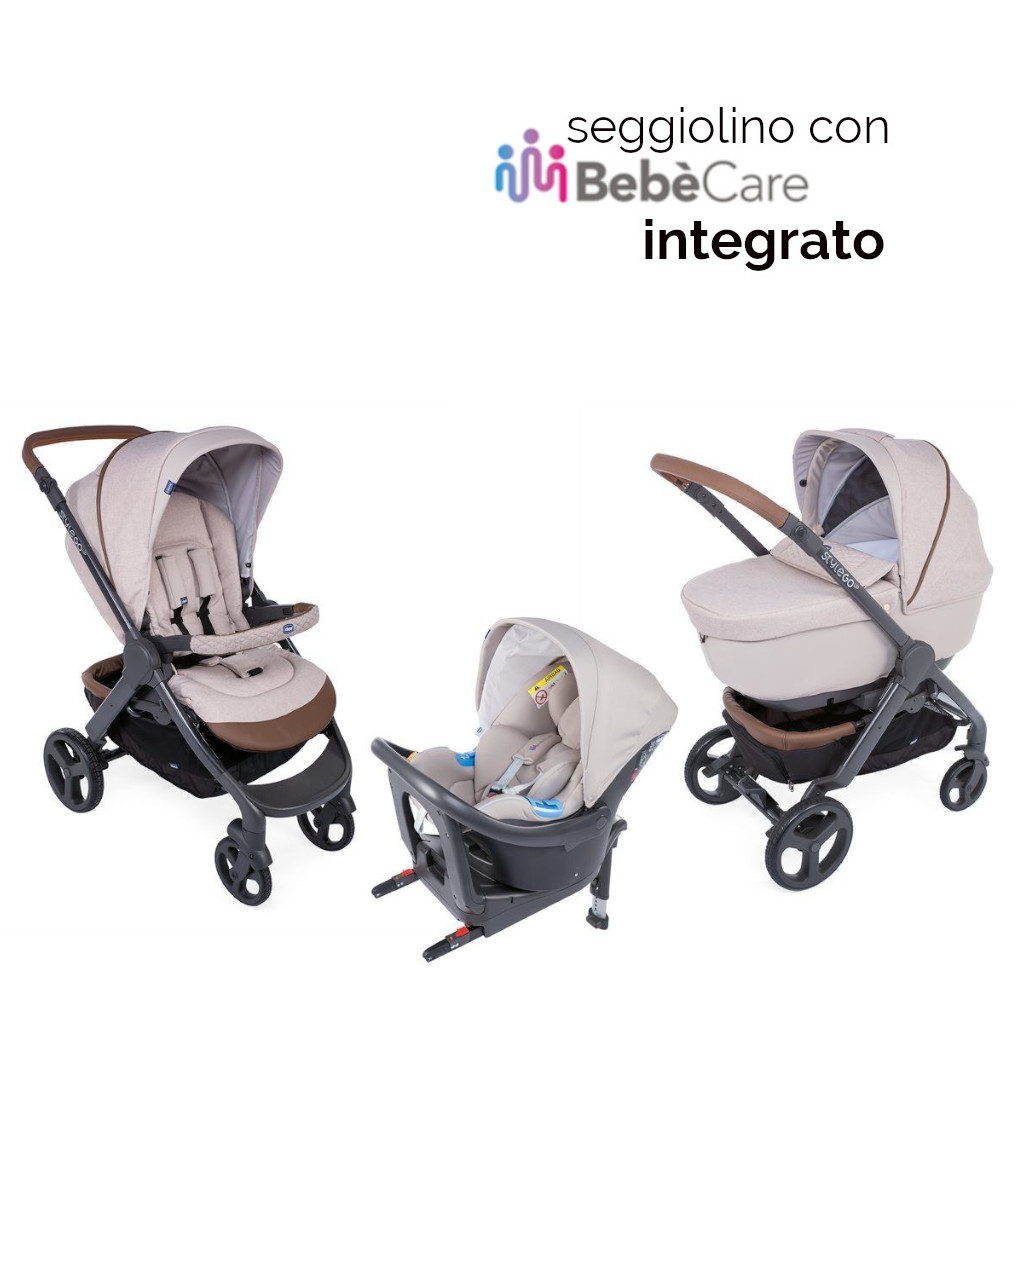 Trio stylego up crossover beige con oasys i-size + bebècare - Chicco